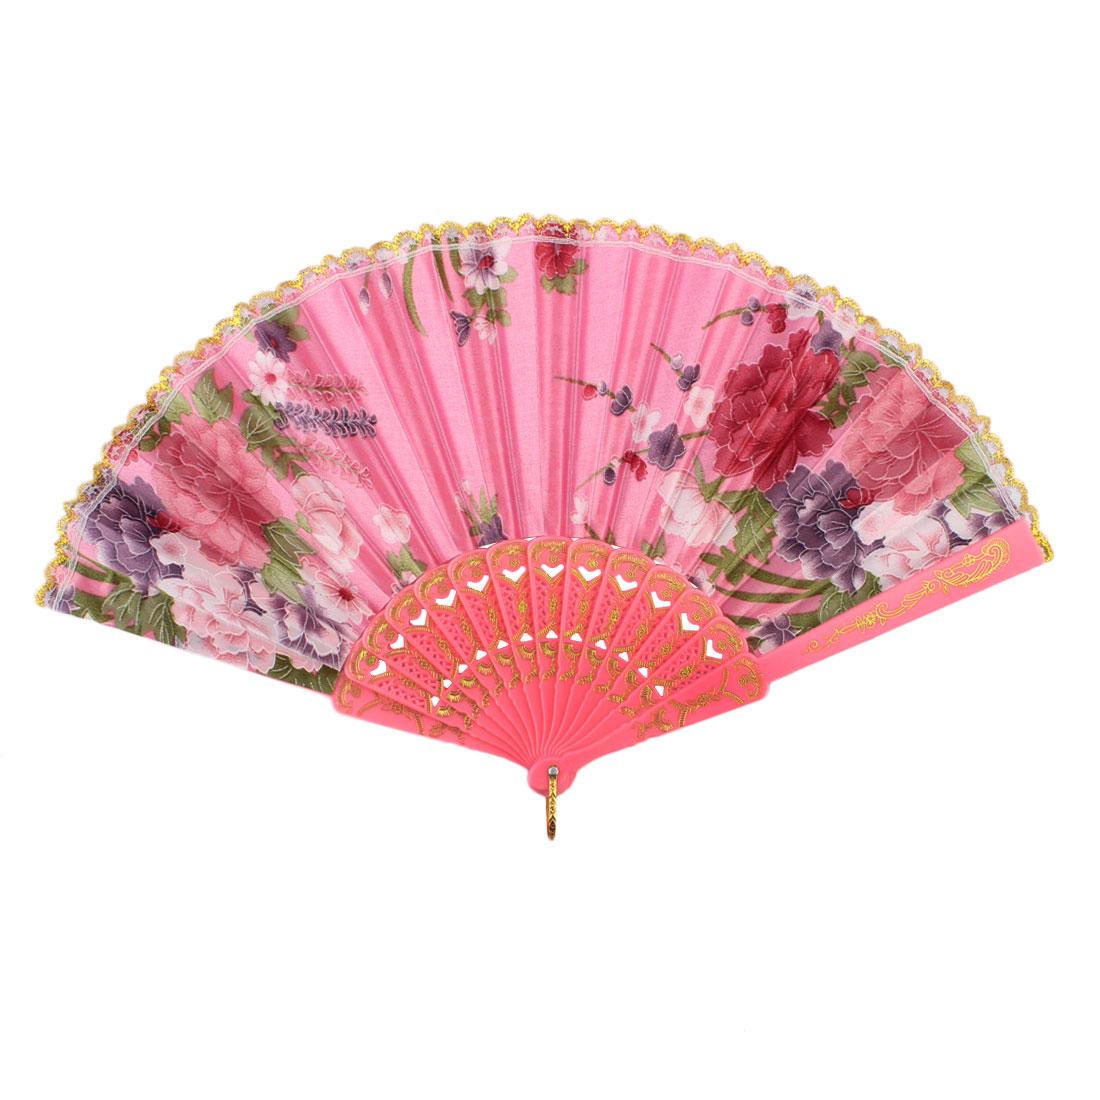 Lady Plastic Frame Flower Pattern Lace Decor Dance Party Folding Hand Fan Pink